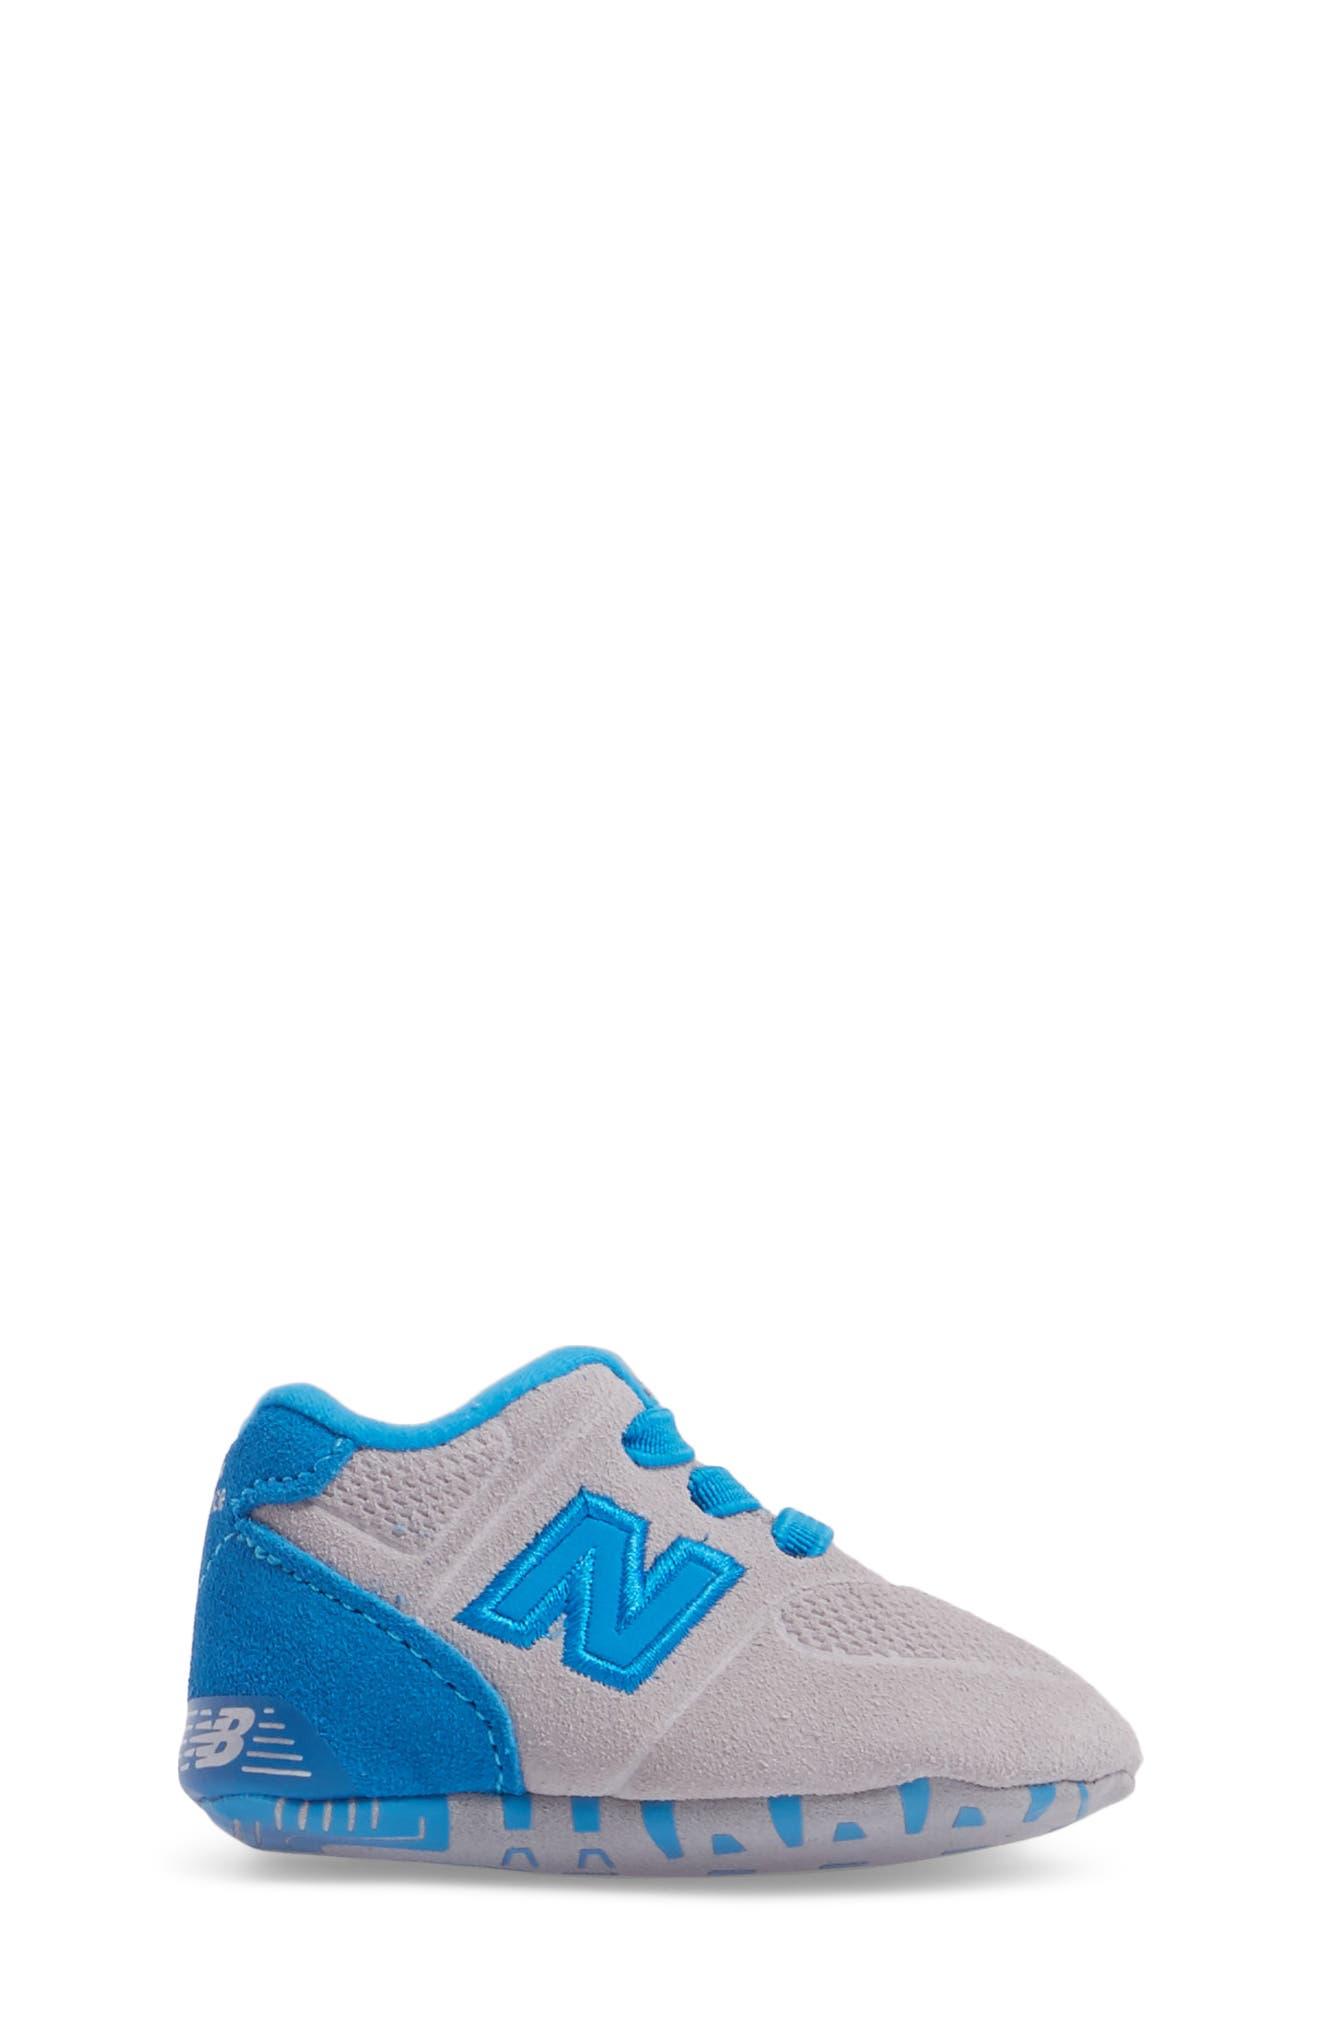 Alternate Image 3  - New Balance 547 Crib Shoe (Baby)